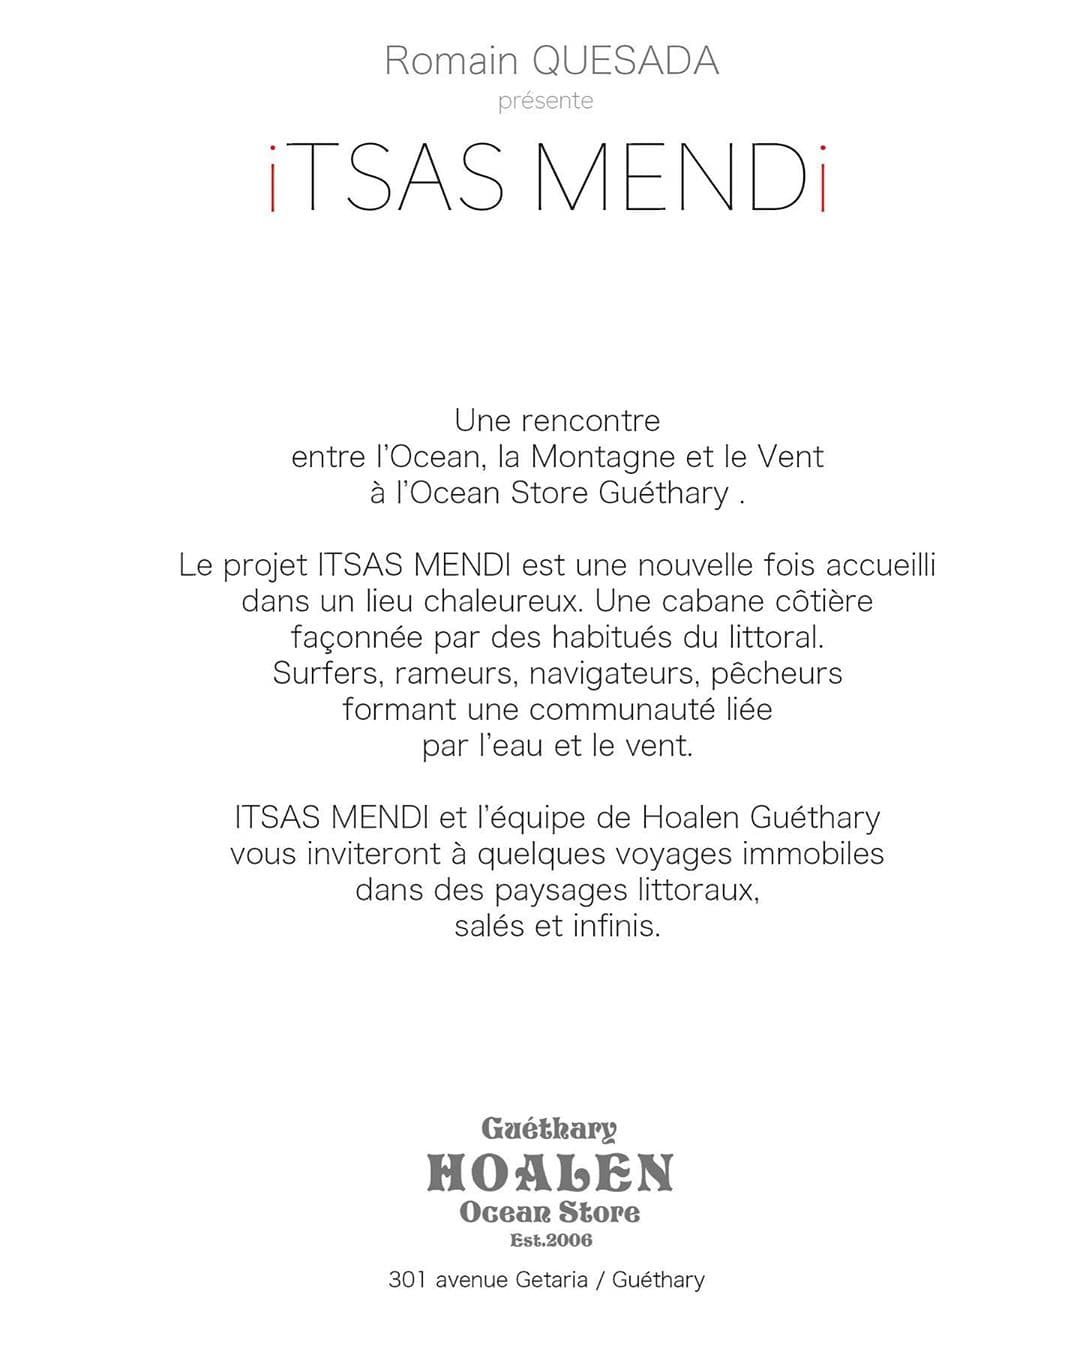 Itsas Mendi Romain Quesada affiche verso exposition